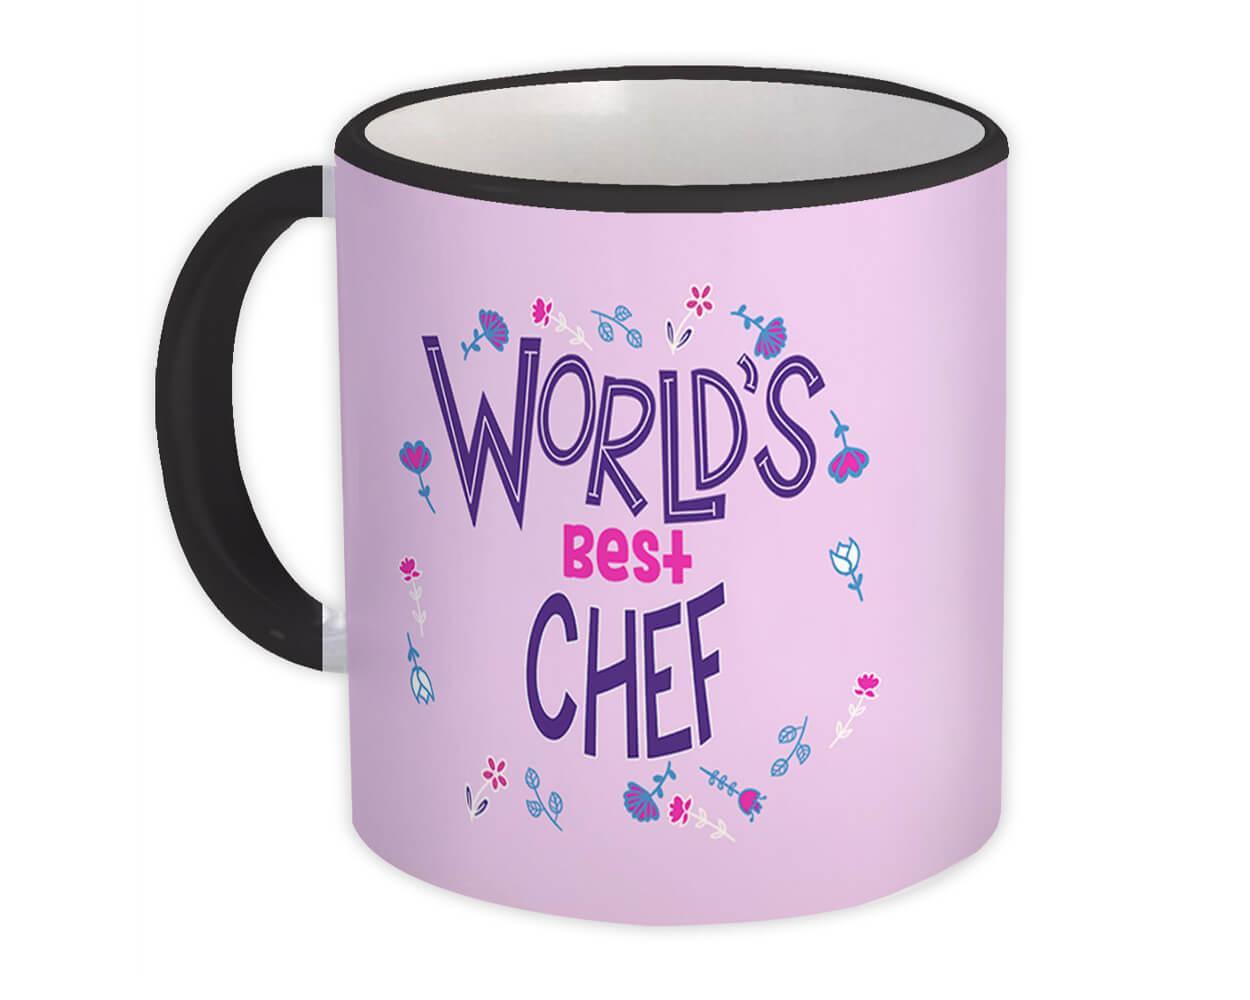 Worlds Best CHEF : Gift Mug Great Floral Profession Coworker Work Job